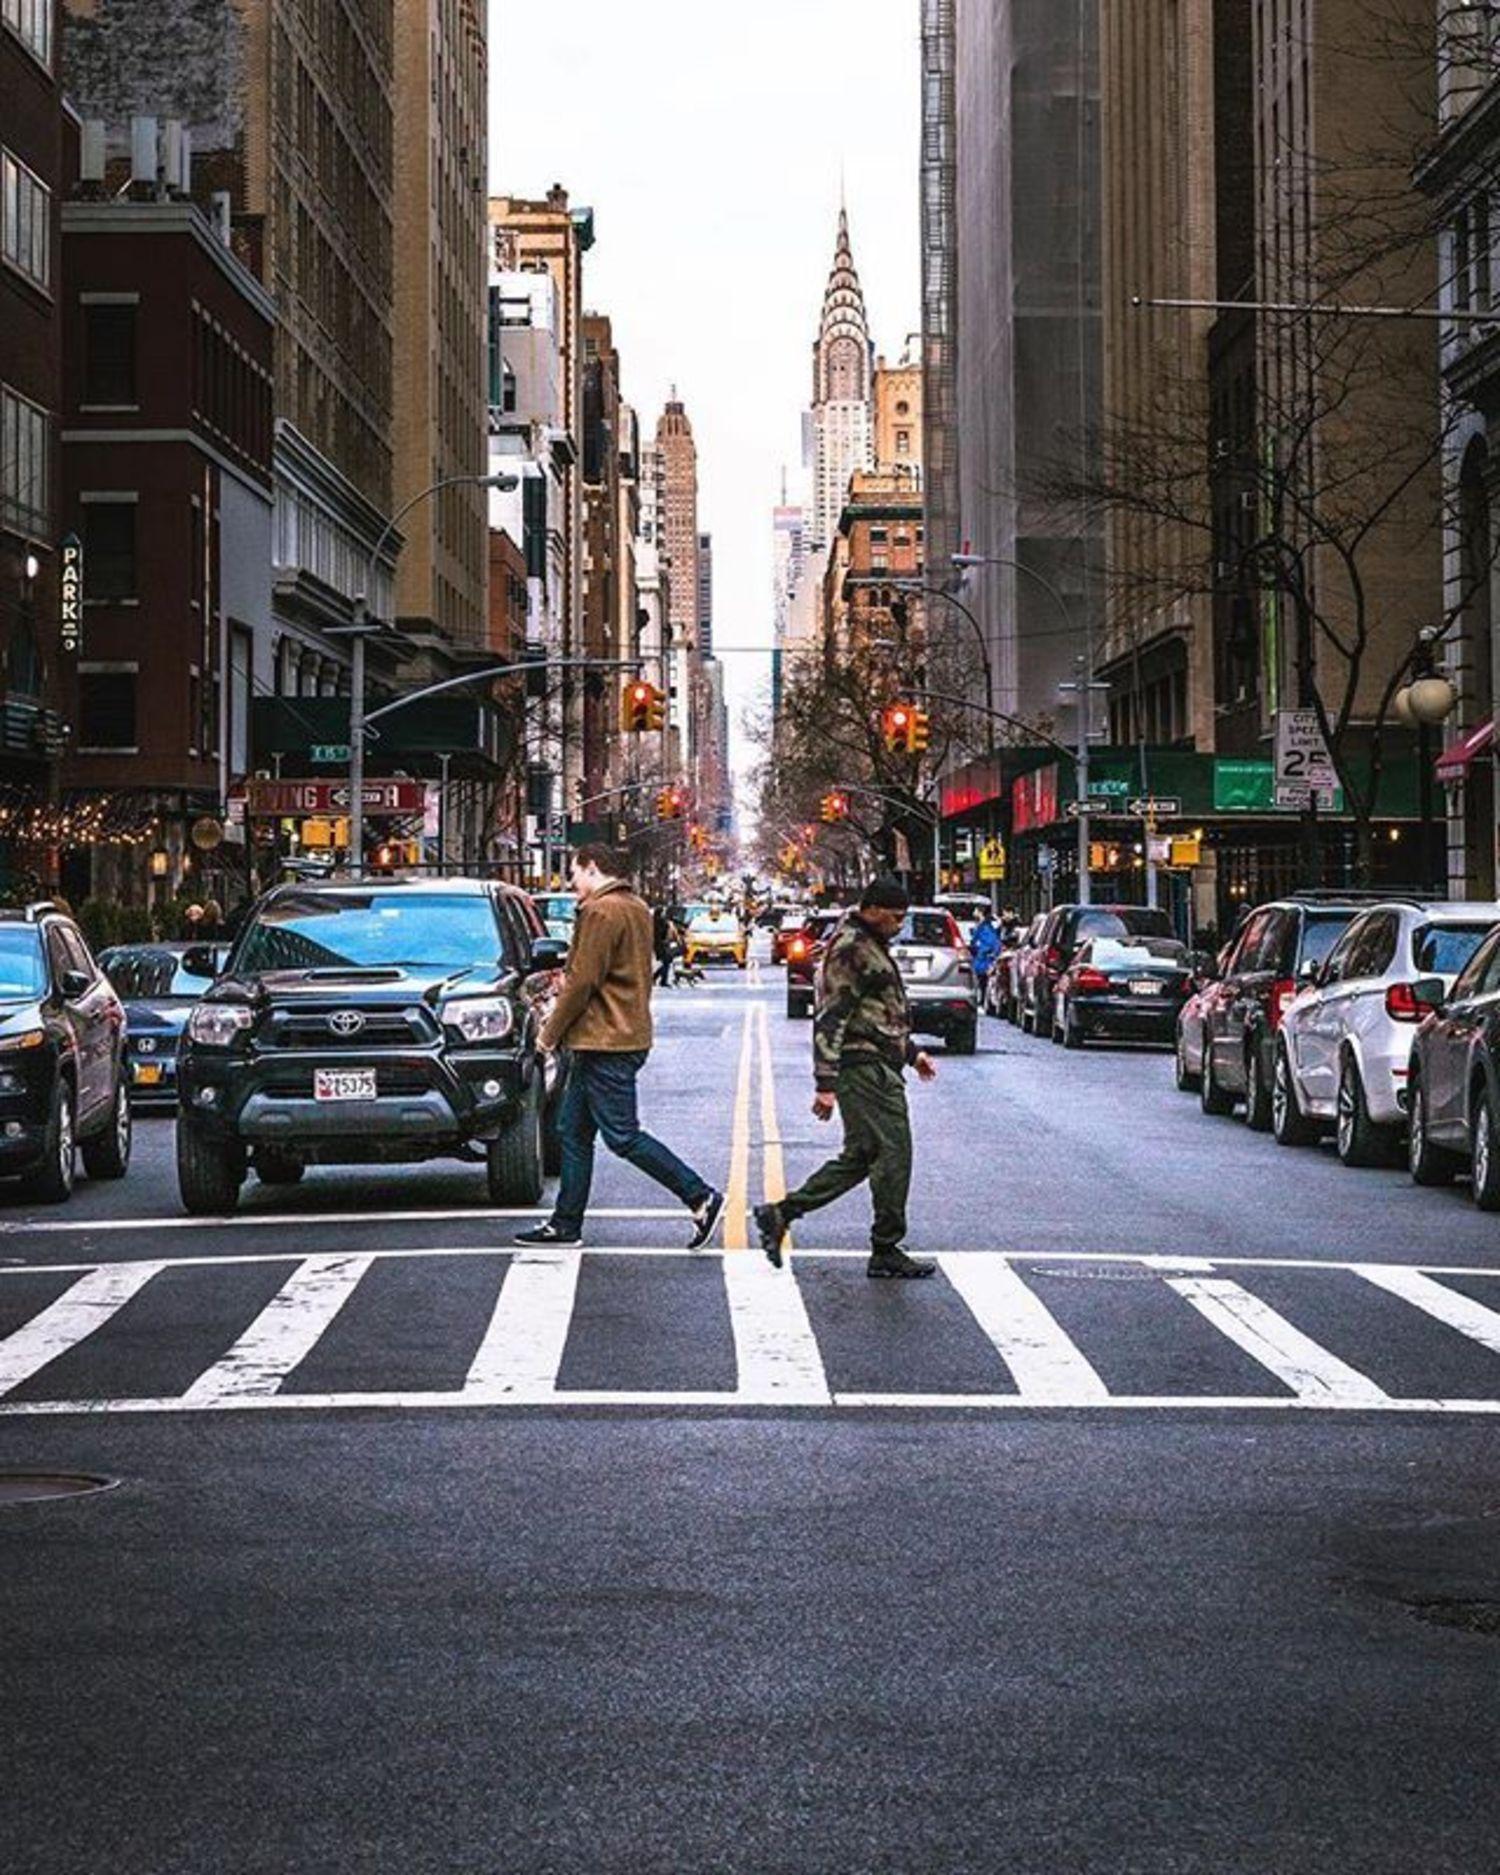 New York, New York. Photo via @craigsbeds #viewingnyc #newyorkcity #newyork #nyc